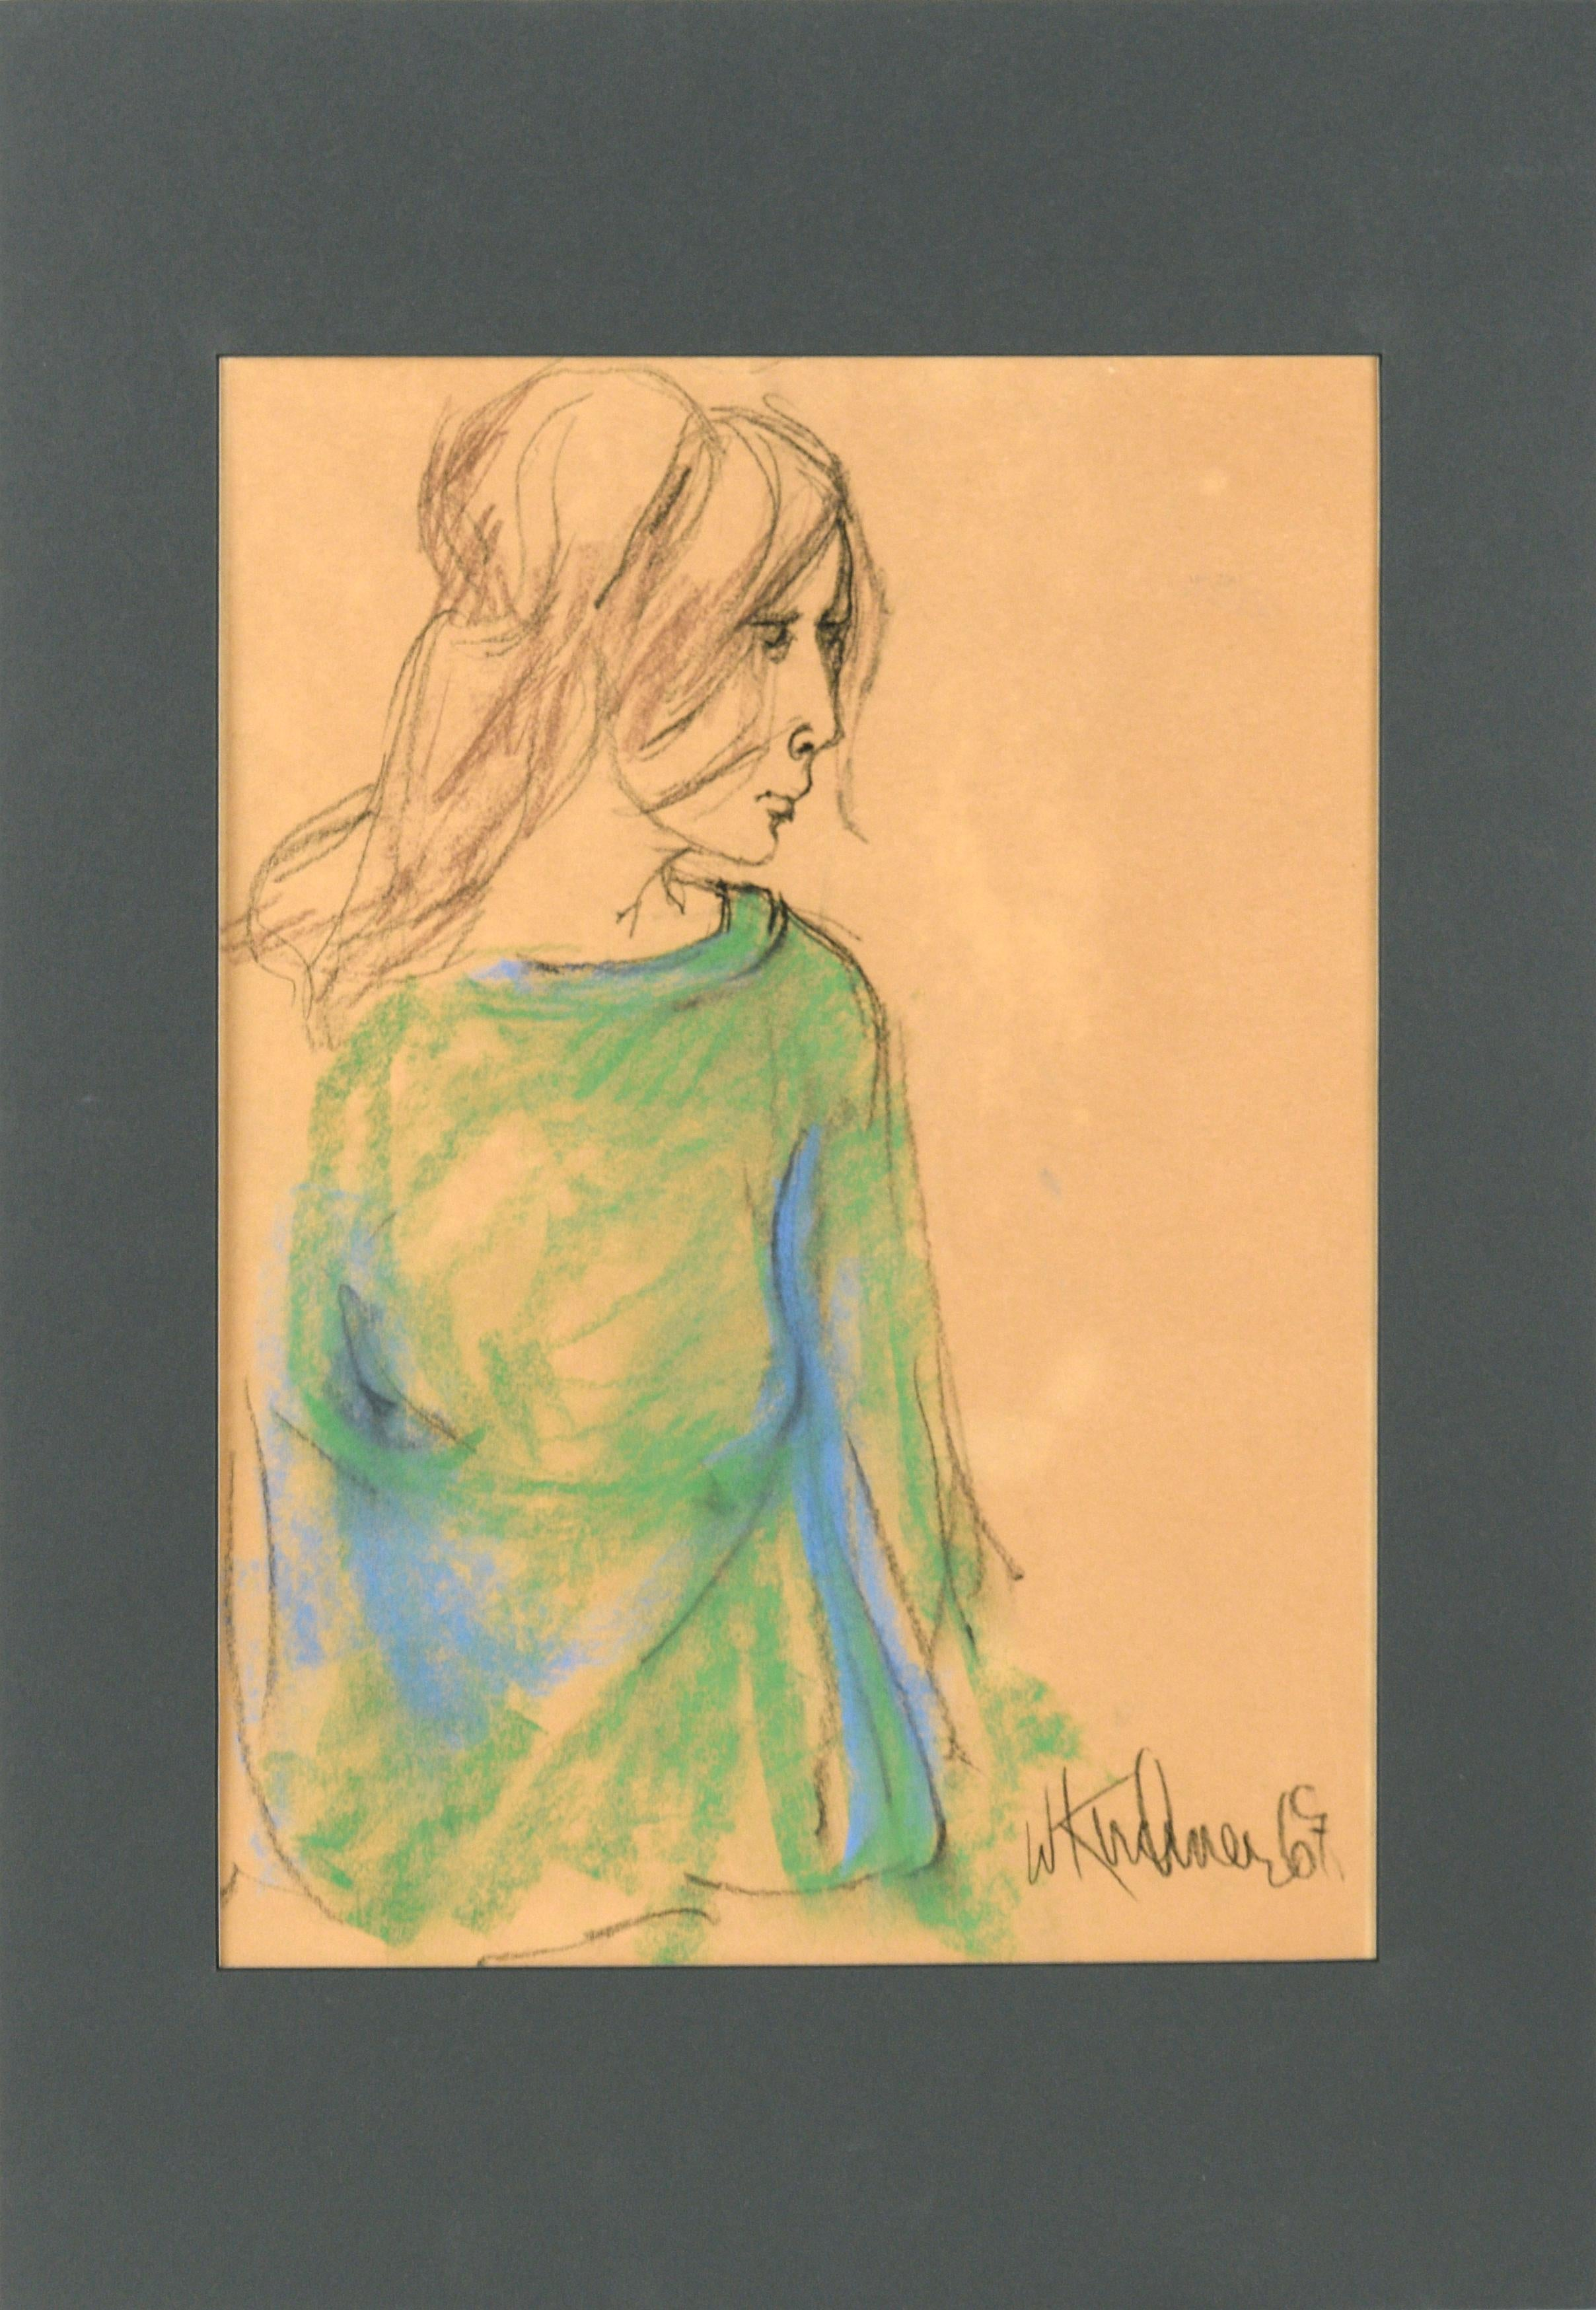 Portrait of a Woman in a Green Shirt - San Francisco Bay Area Figurative Movemen